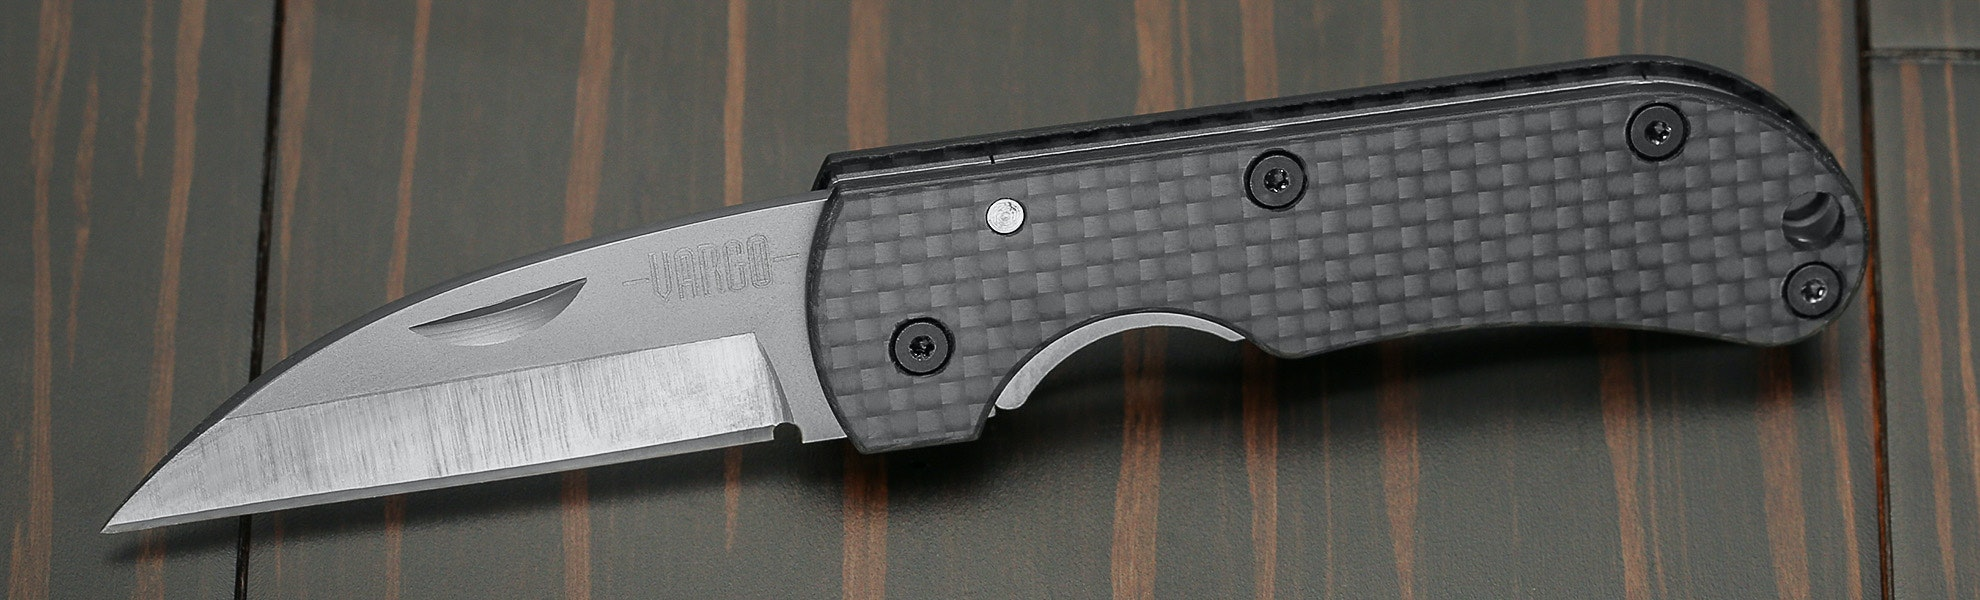 Vargo Ti-Carbon Folding Knife